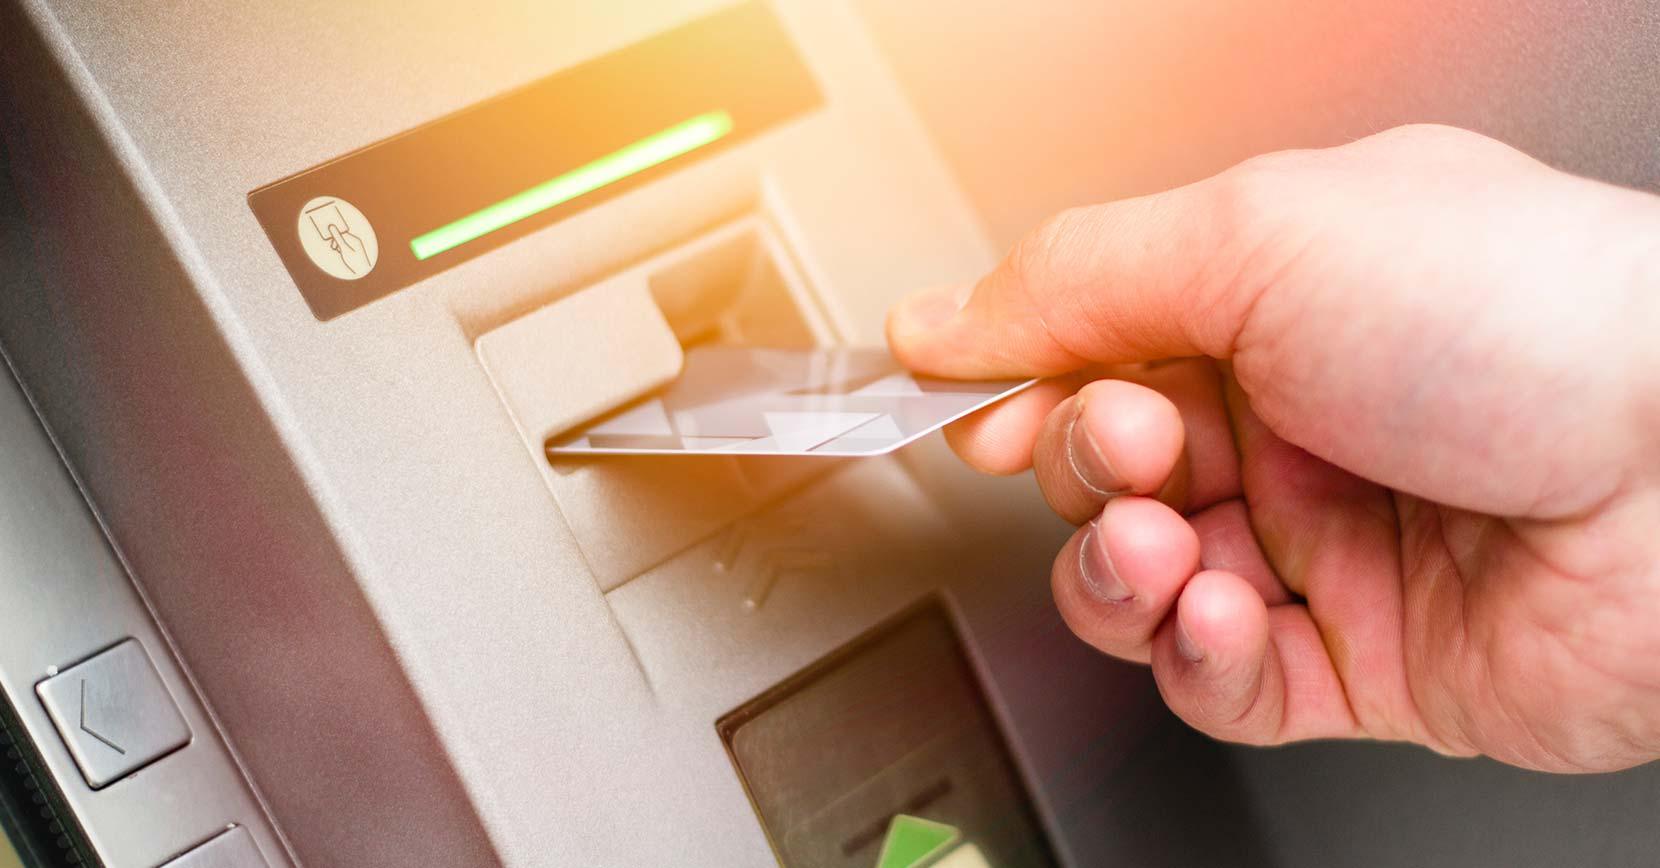 Cancelar transferência bancária